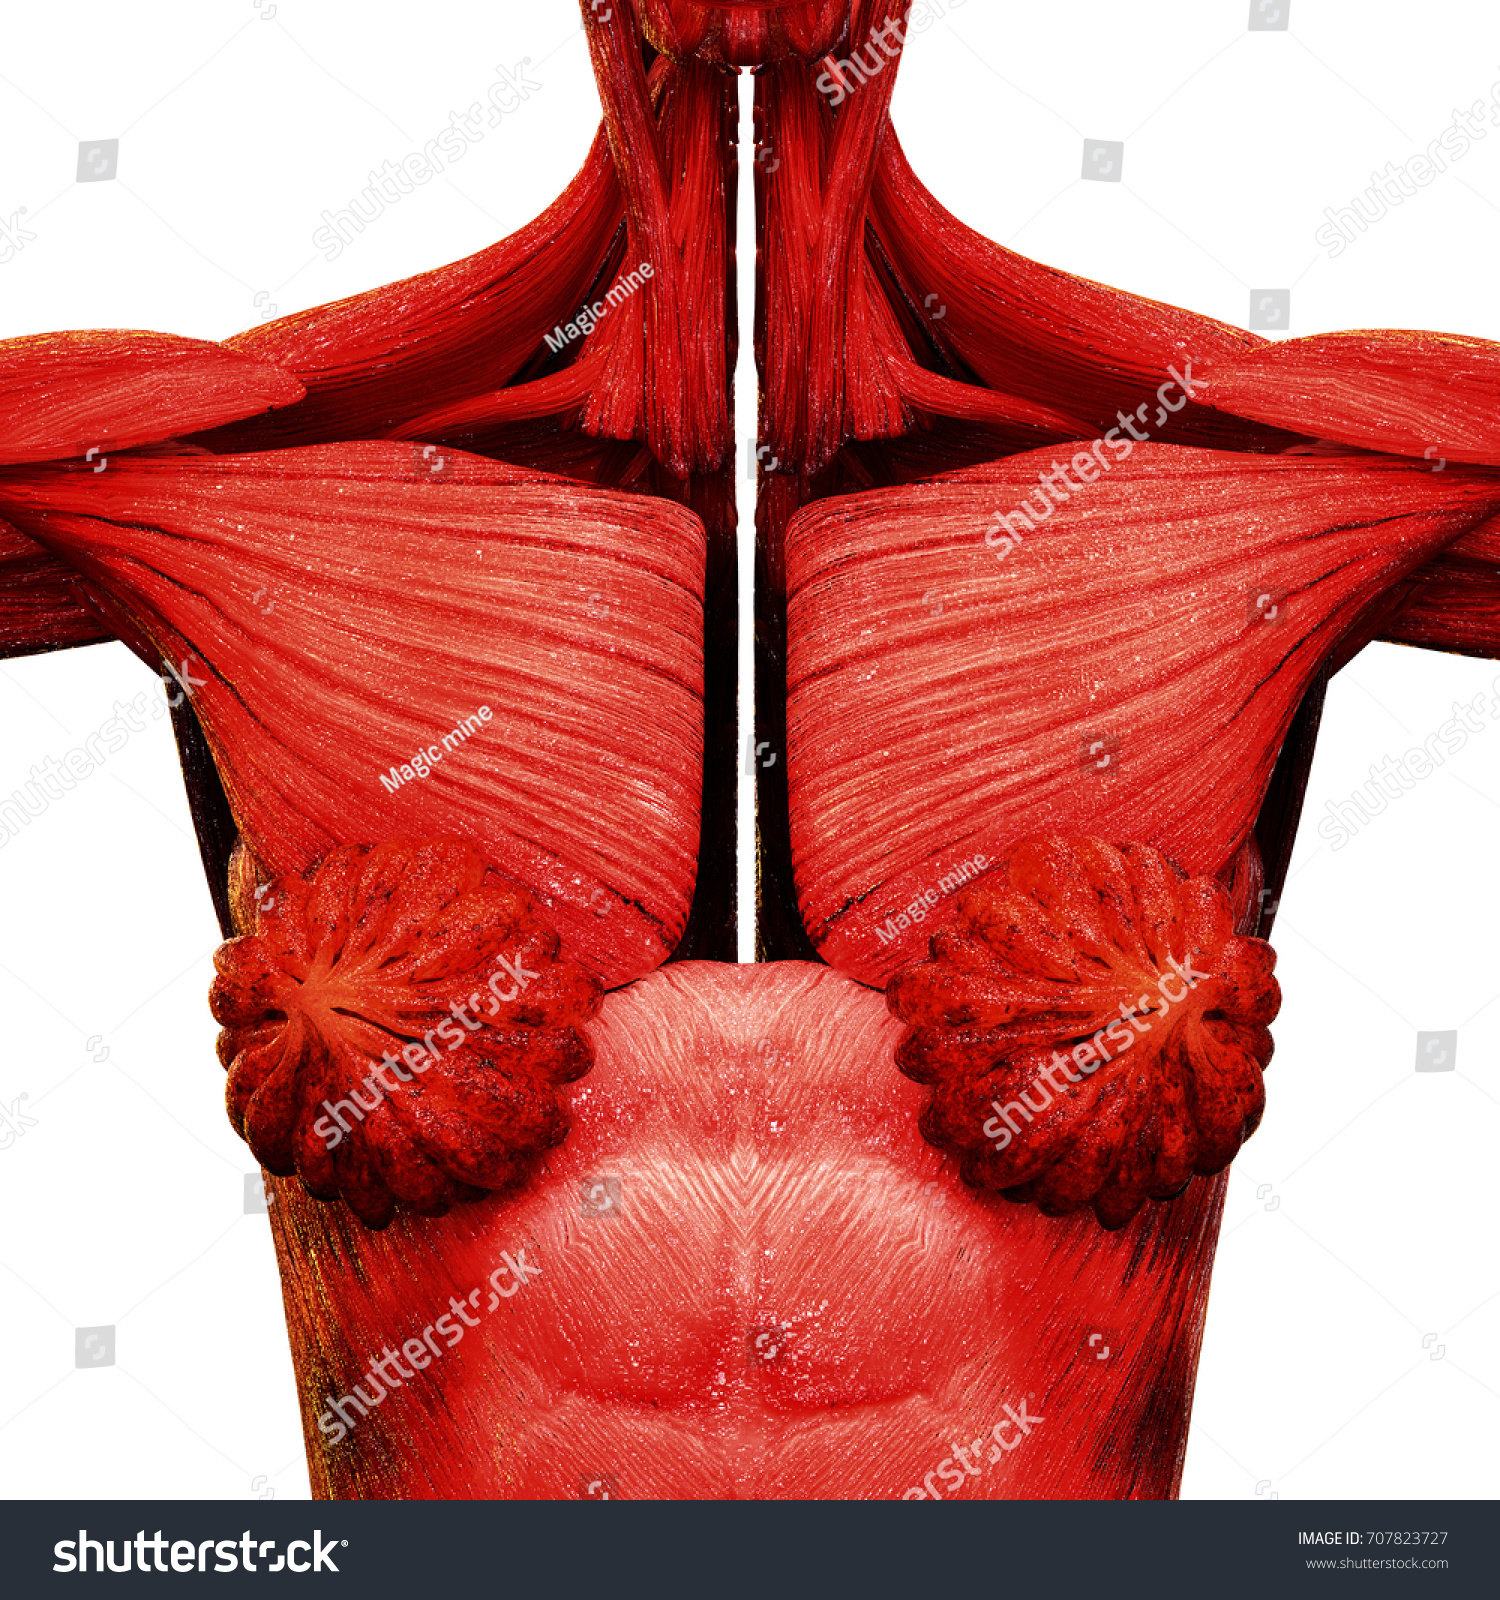 Human Female Body Organs Mammary Glands Stock Illustration 707823727 ...